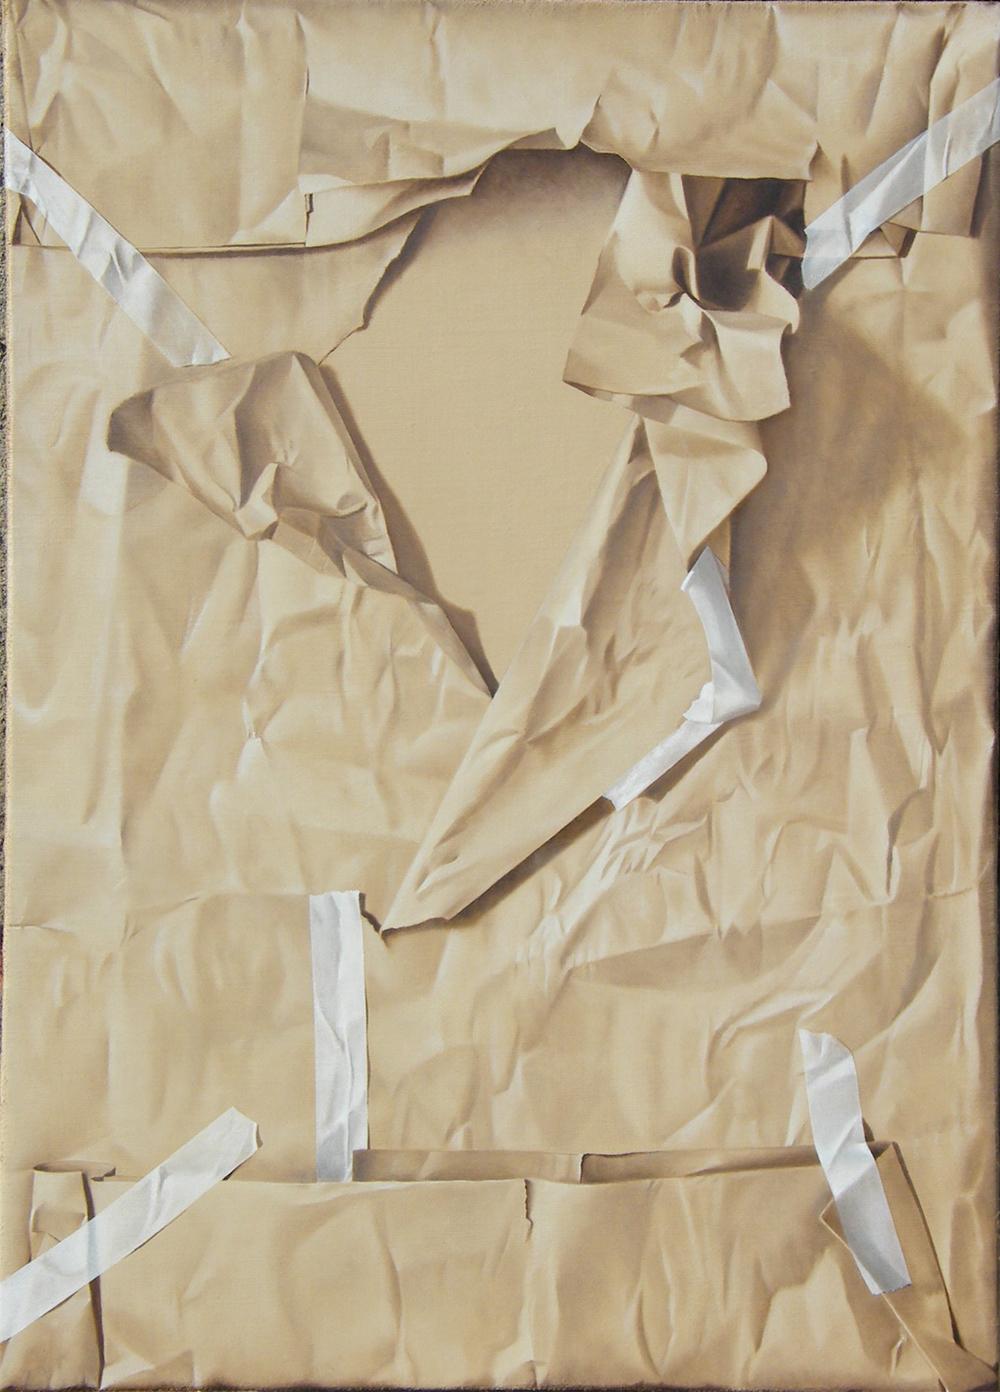 Furto d'artista n°2, 2012, Olio su tela, 50 x 70 cm